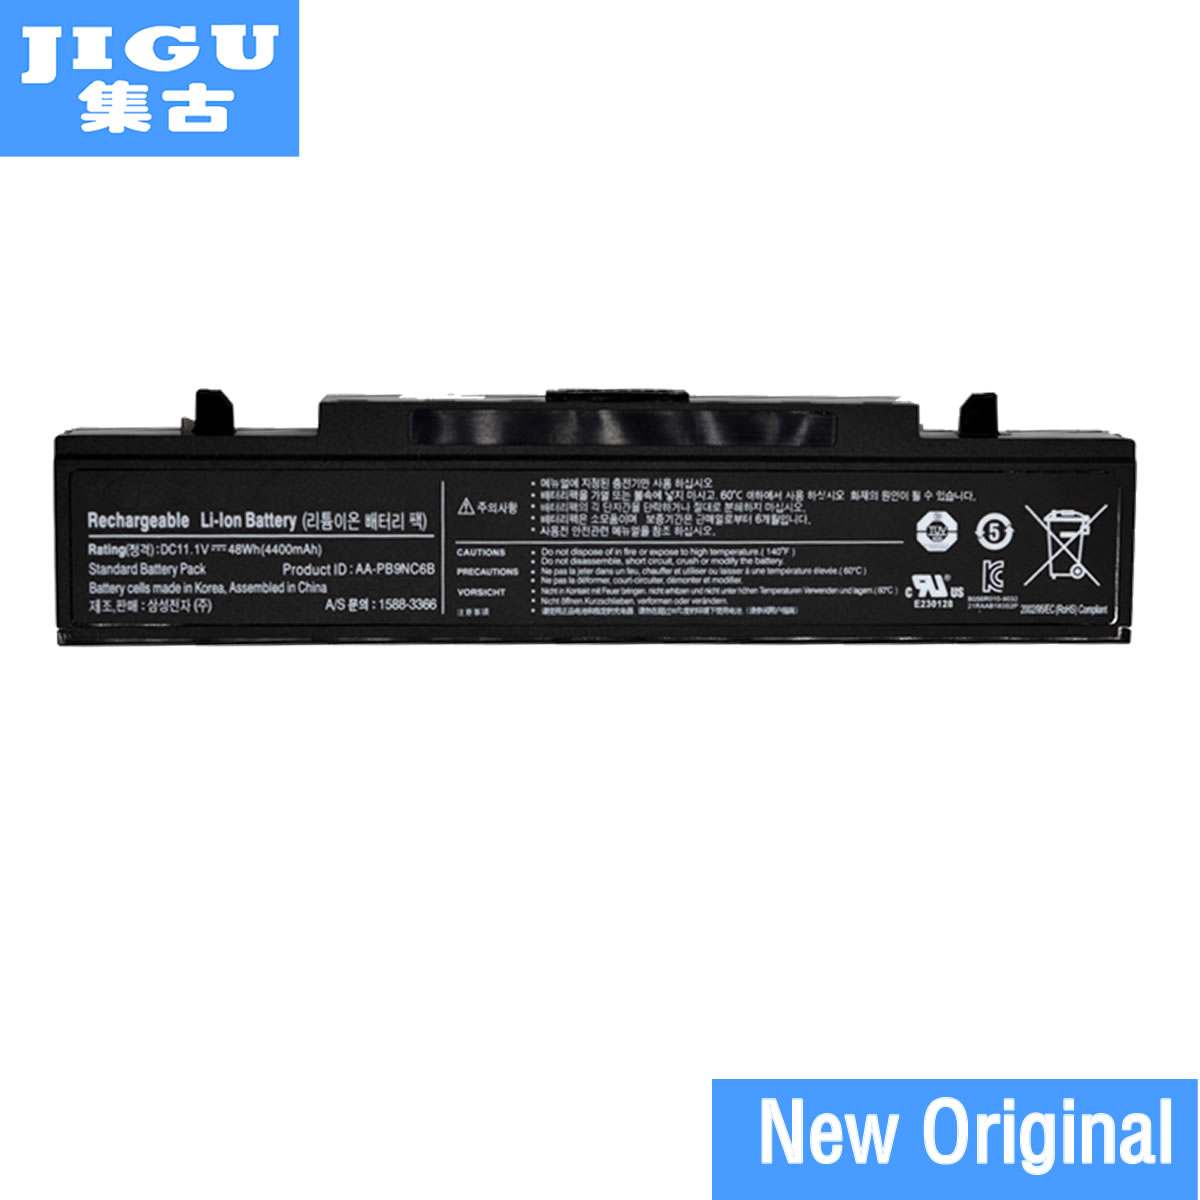 JIGU Original Laptop Battery For SAMSUNG R718 R720 R728 R730 RC410 RC510 RC512 RC710 RC730 RF410 RF411 RF510 RF511